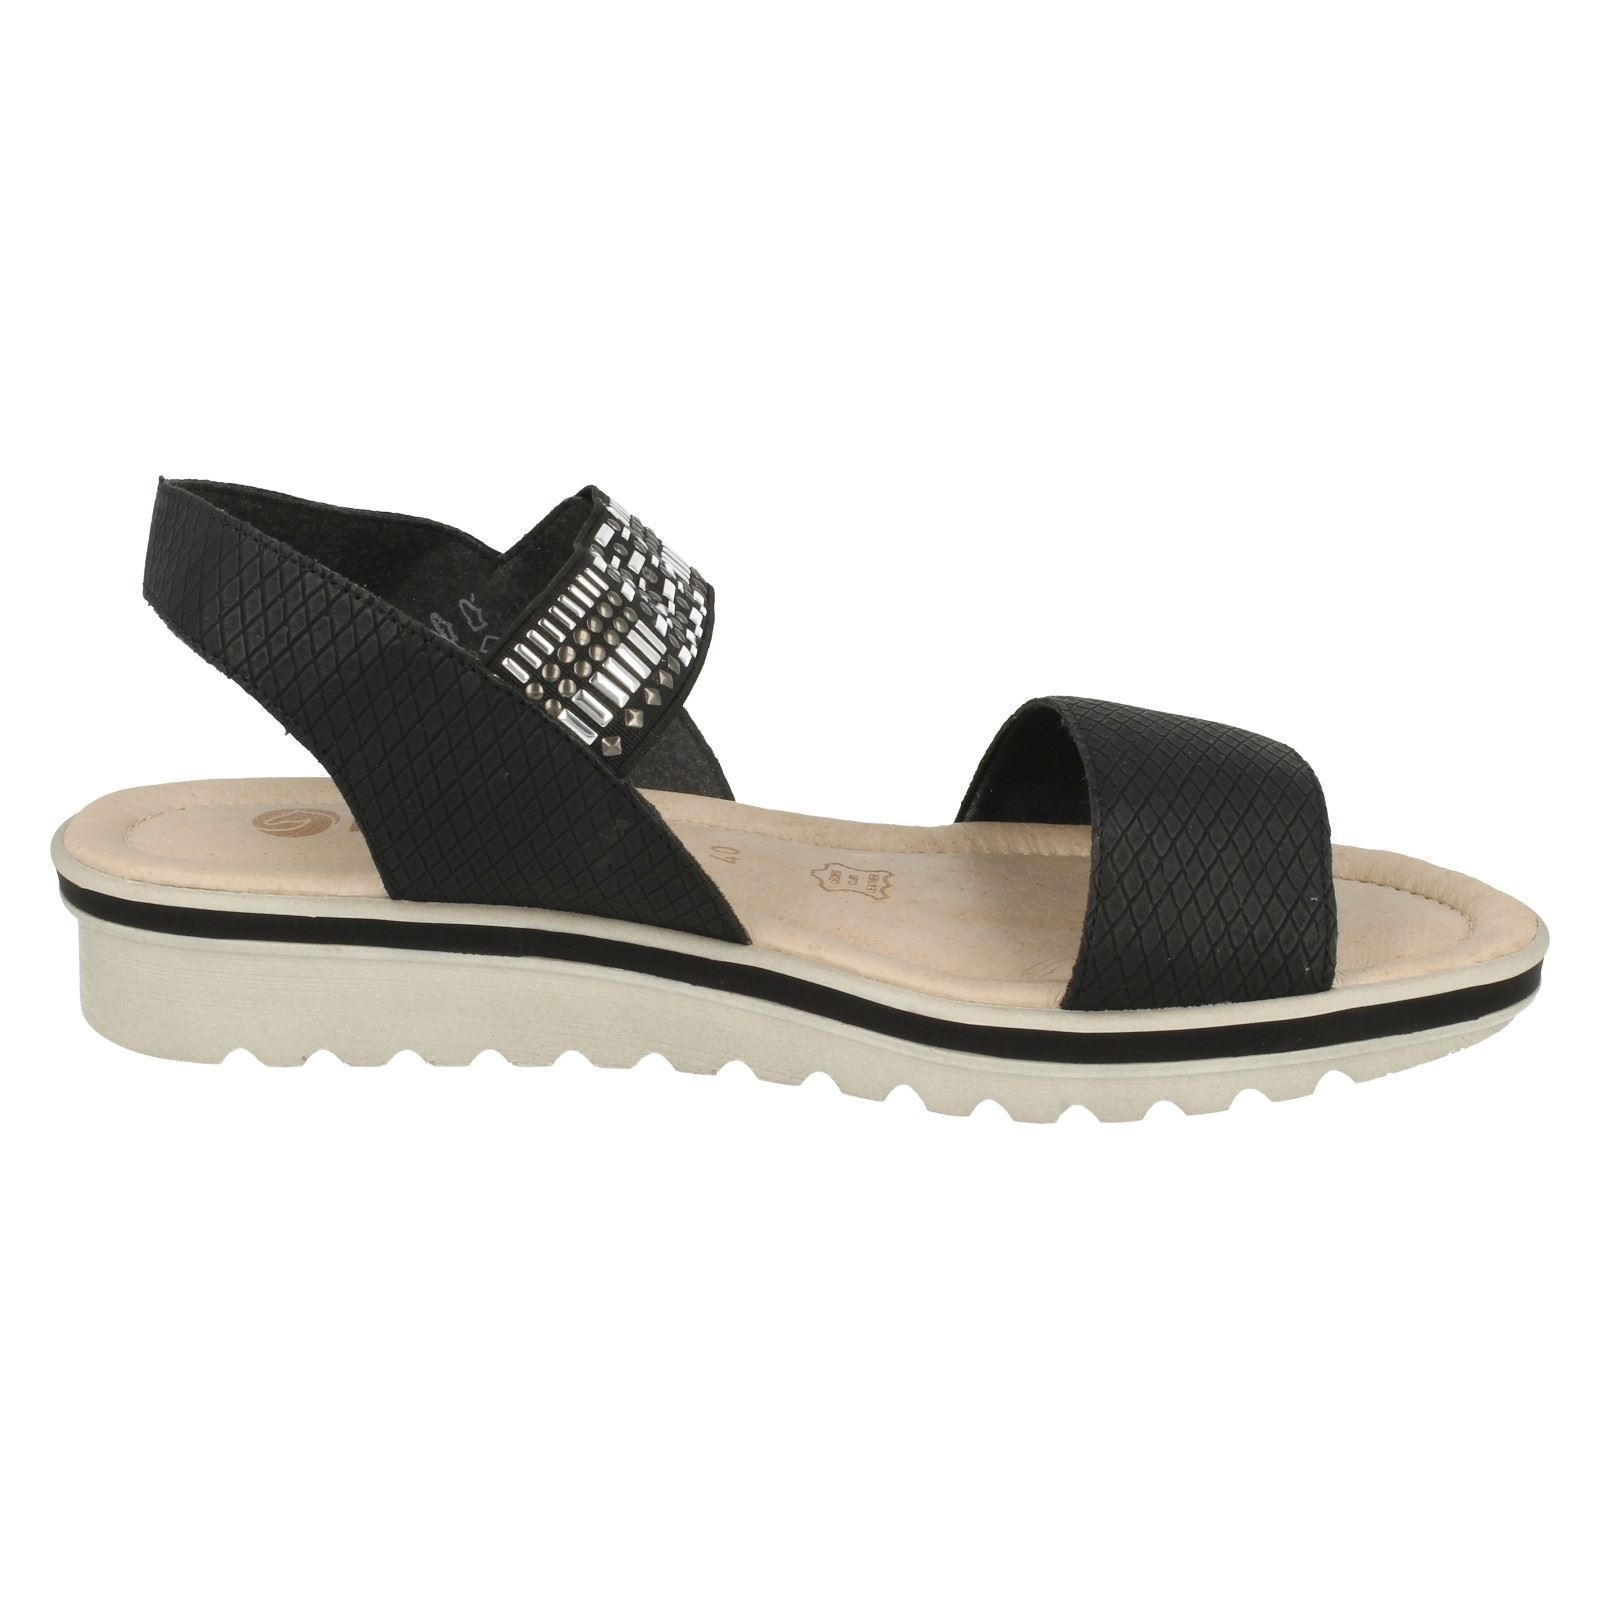 Ladies Black Remonte Style Sandals R4551 qHqCr